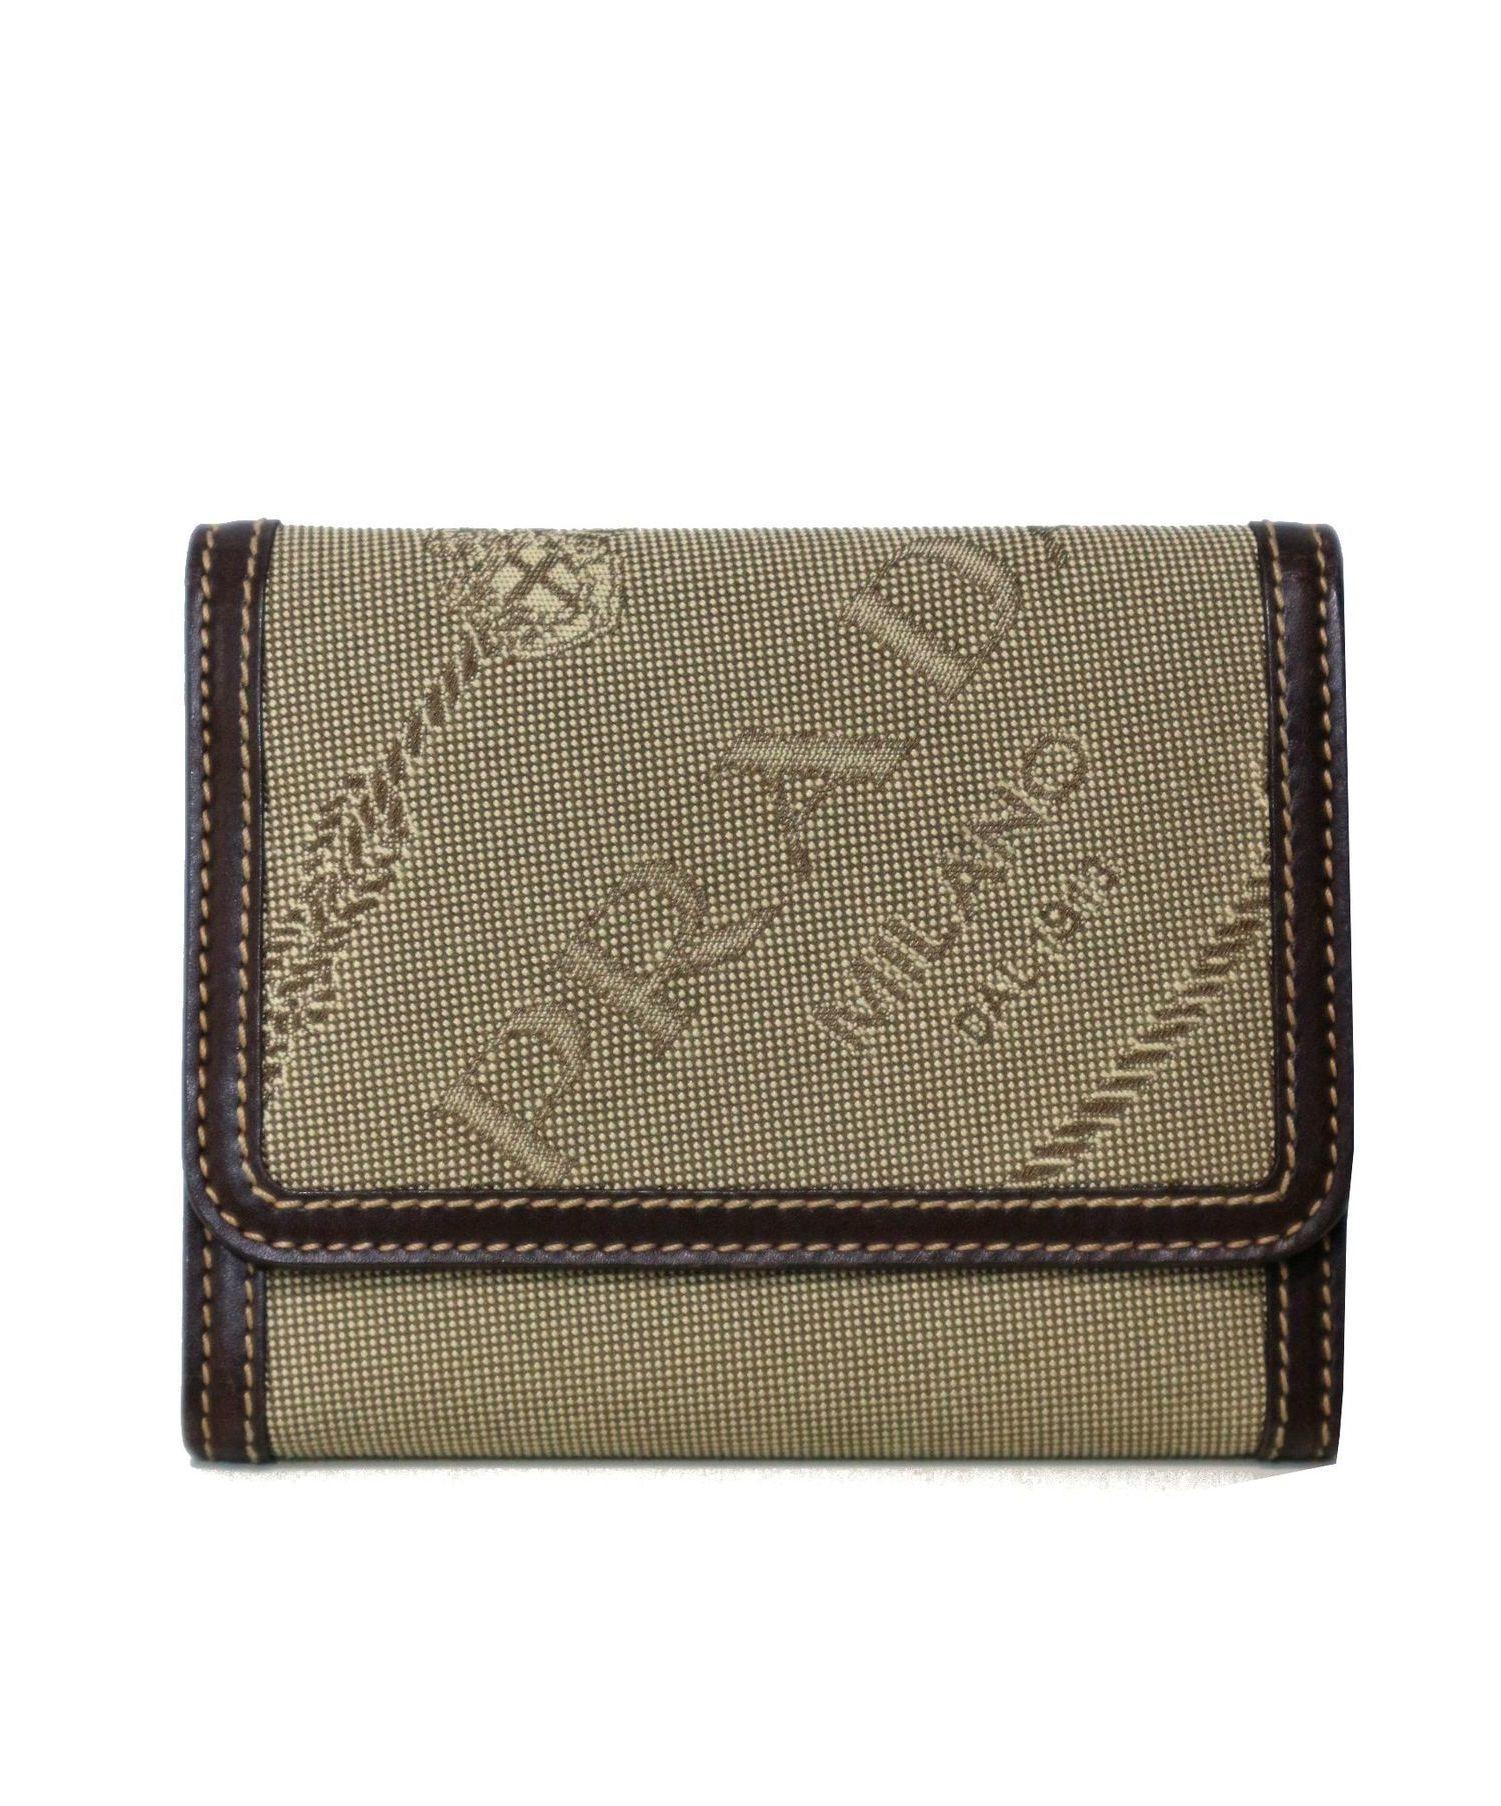 timeless design e31be f2563 [中古]PRADA(プラダ)のレディース 服飾小物 ジャガード3つ折り財布